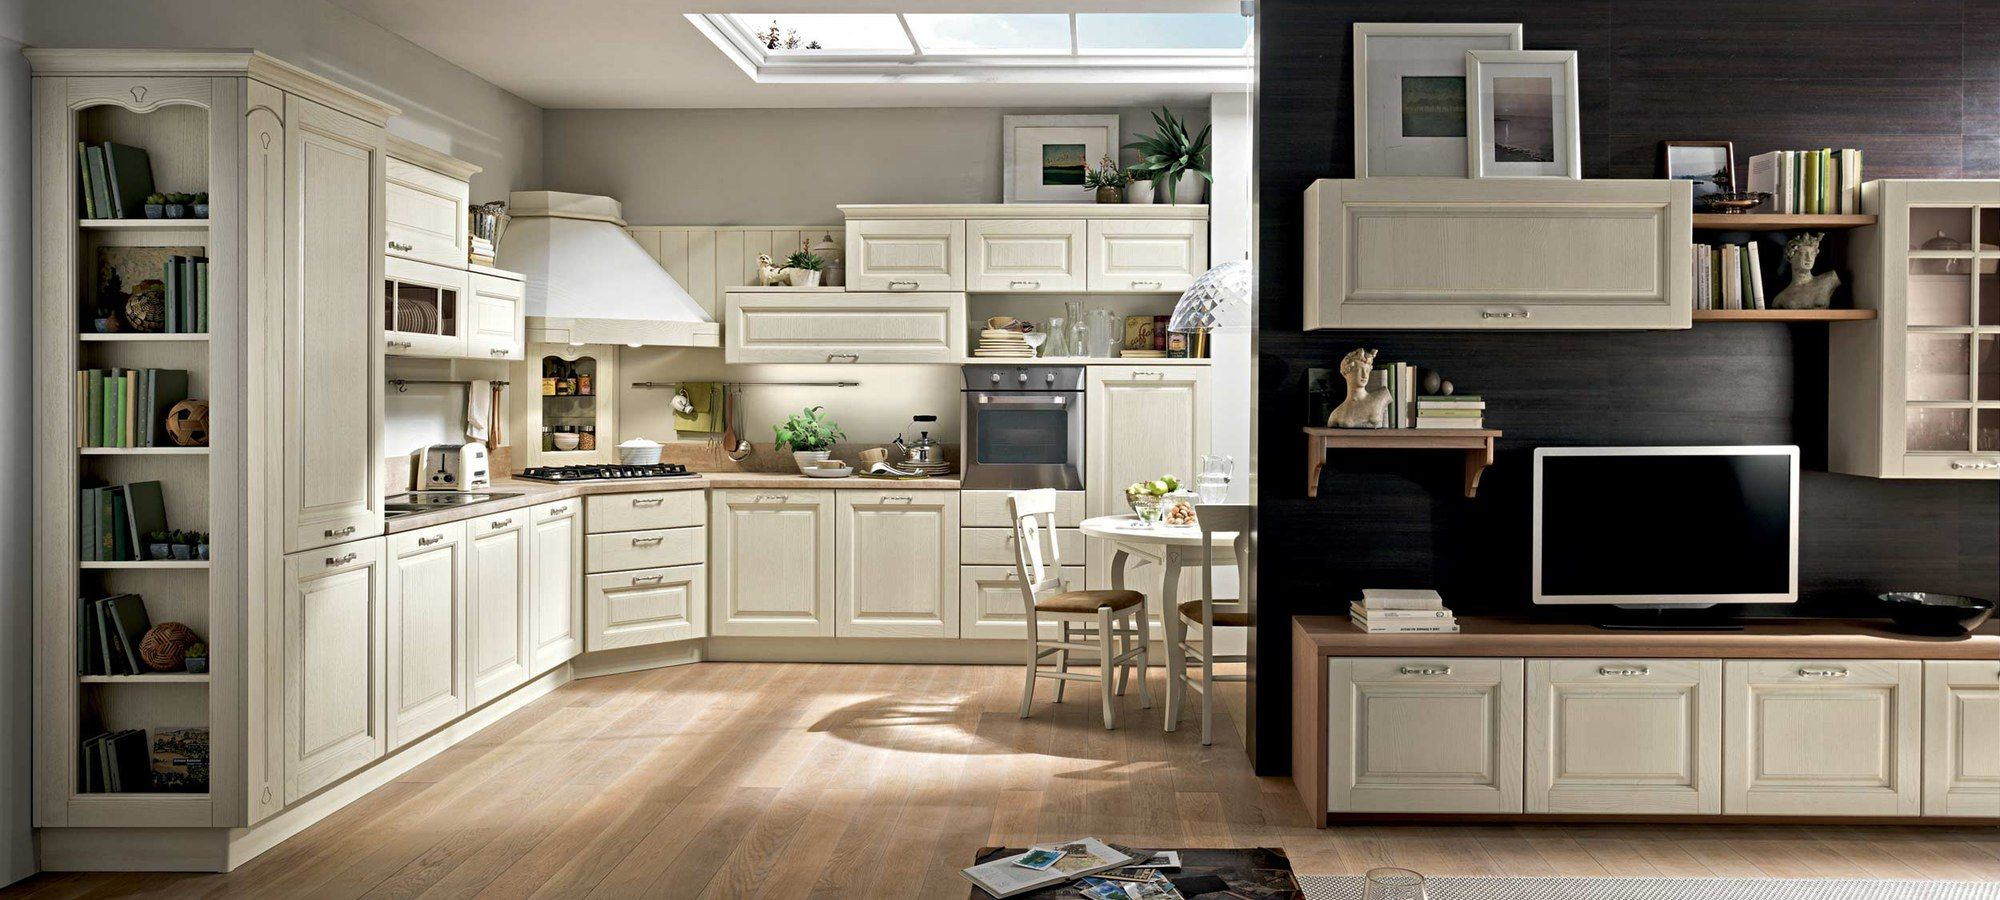 Cucine classiche – Stosa Cucine | Cucine | Pinterest